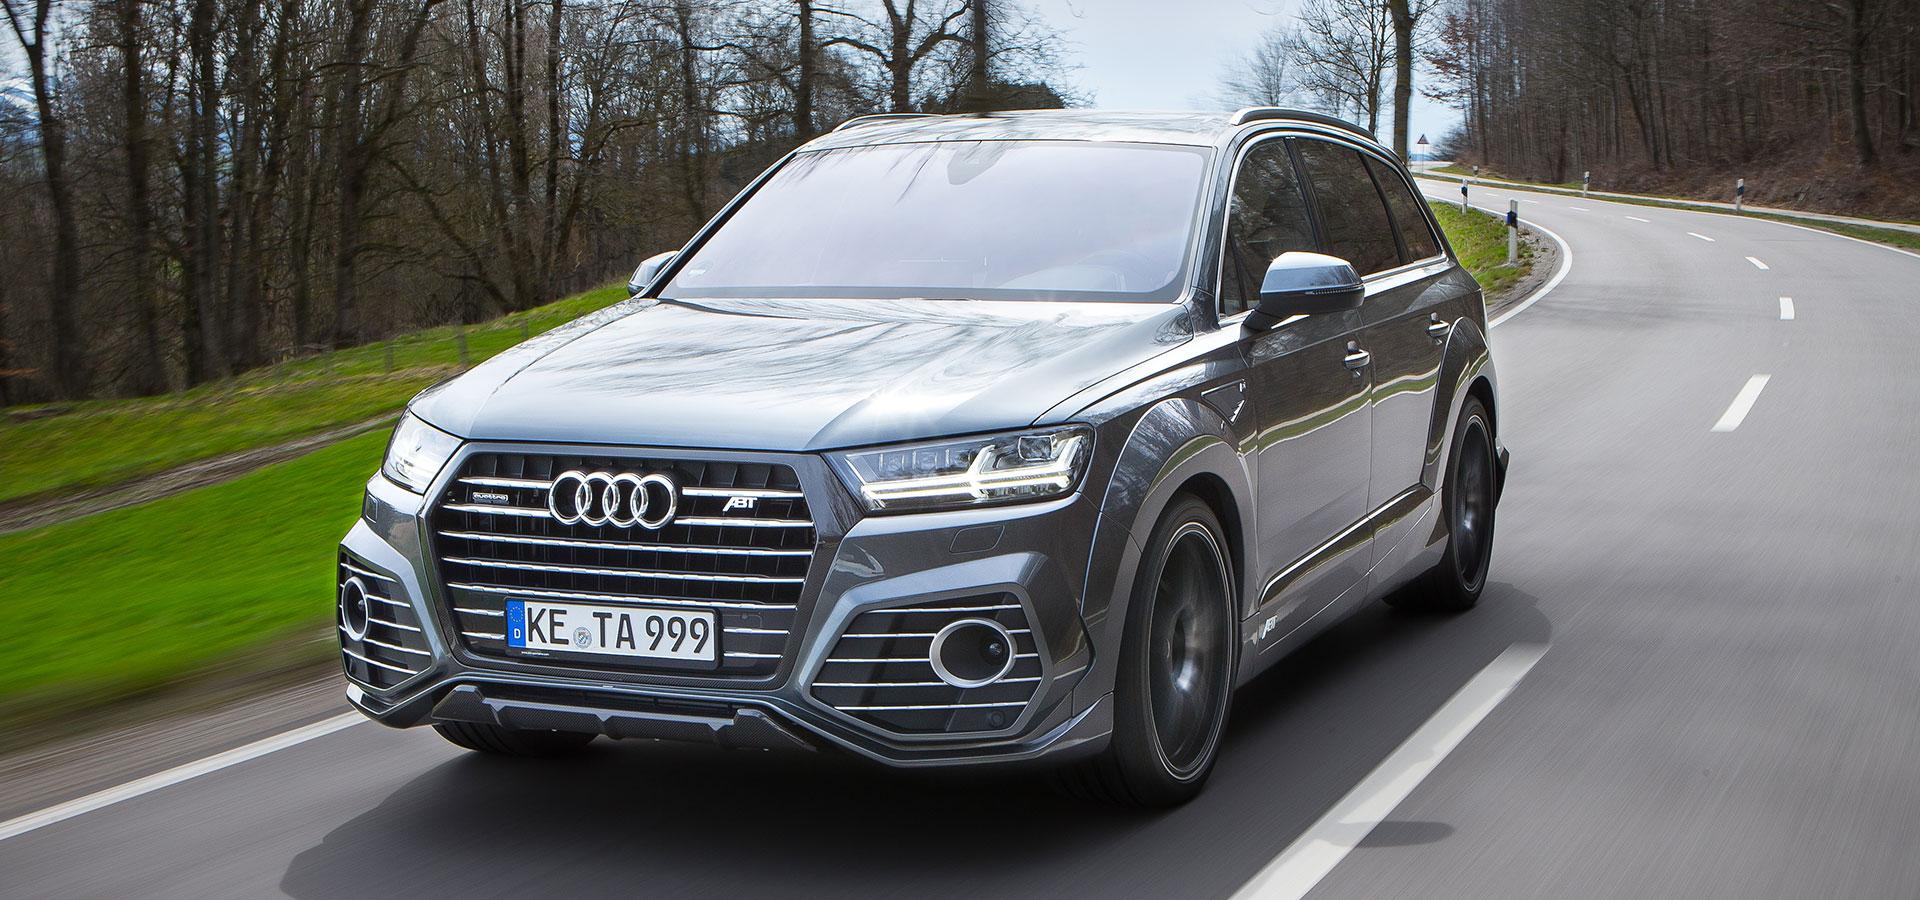 Audi Q ABT Sportsline - Audi sq7 price